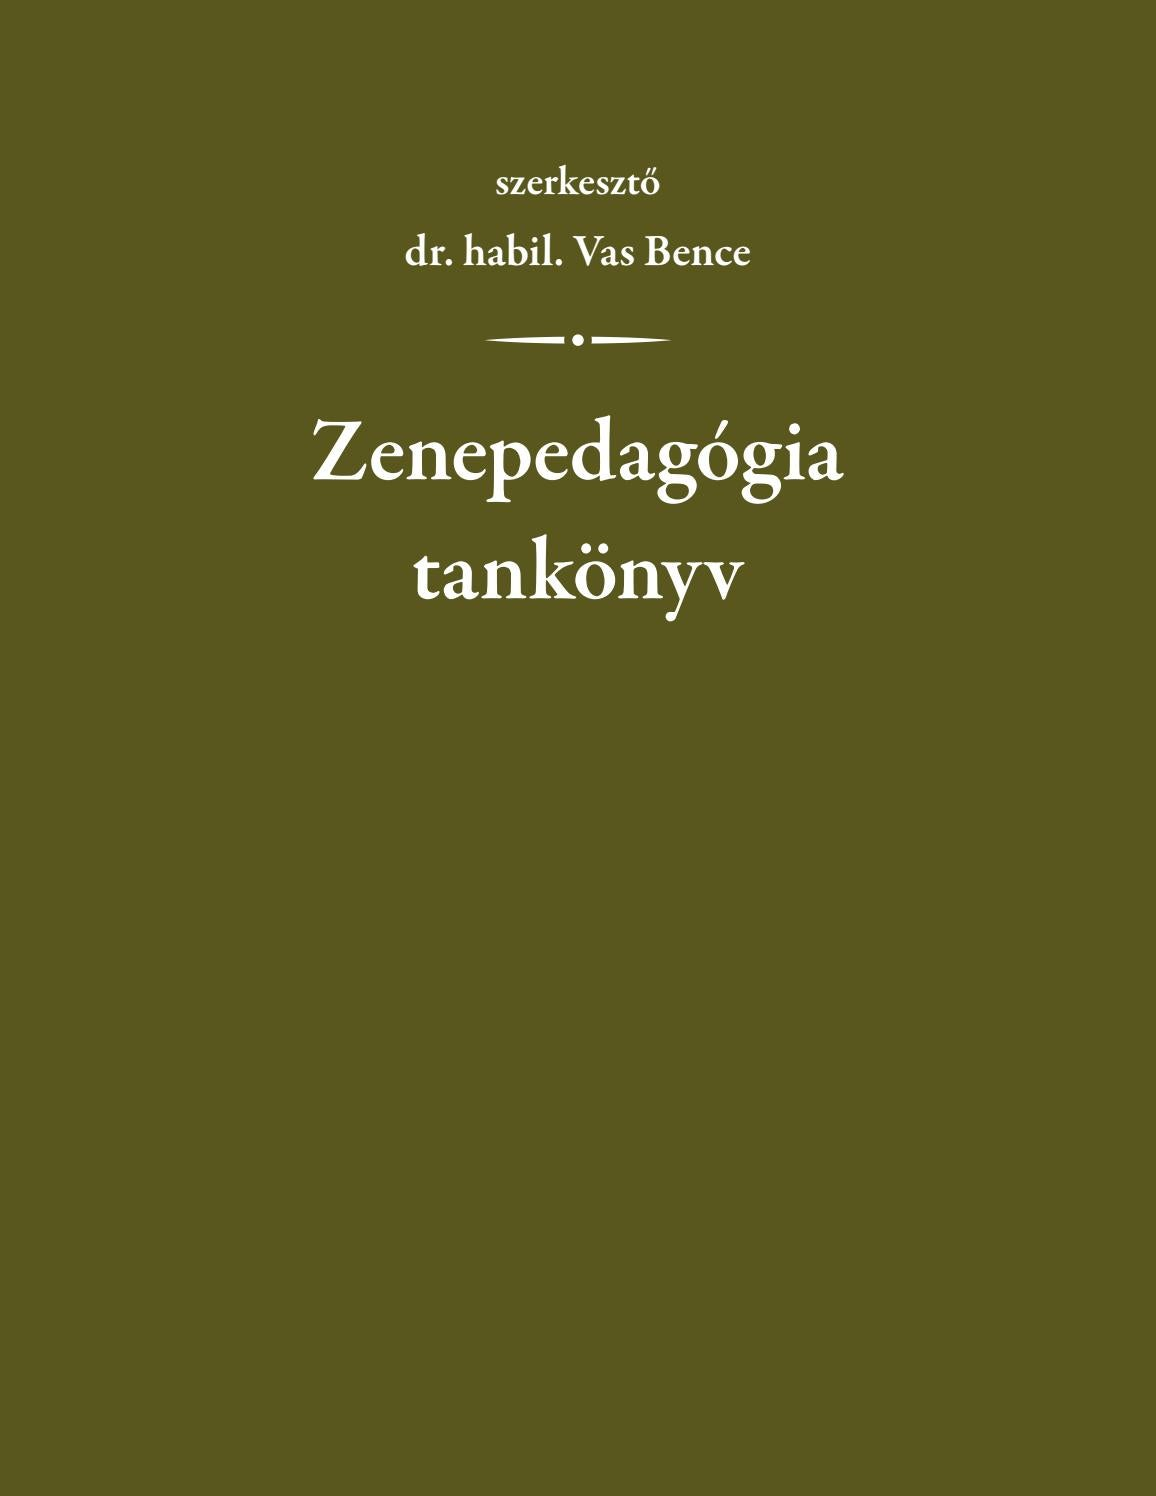 00f2d13958 Vas Bence (szerk.): Zenepedagógia tankönyv by Matyas Bolya - issuu